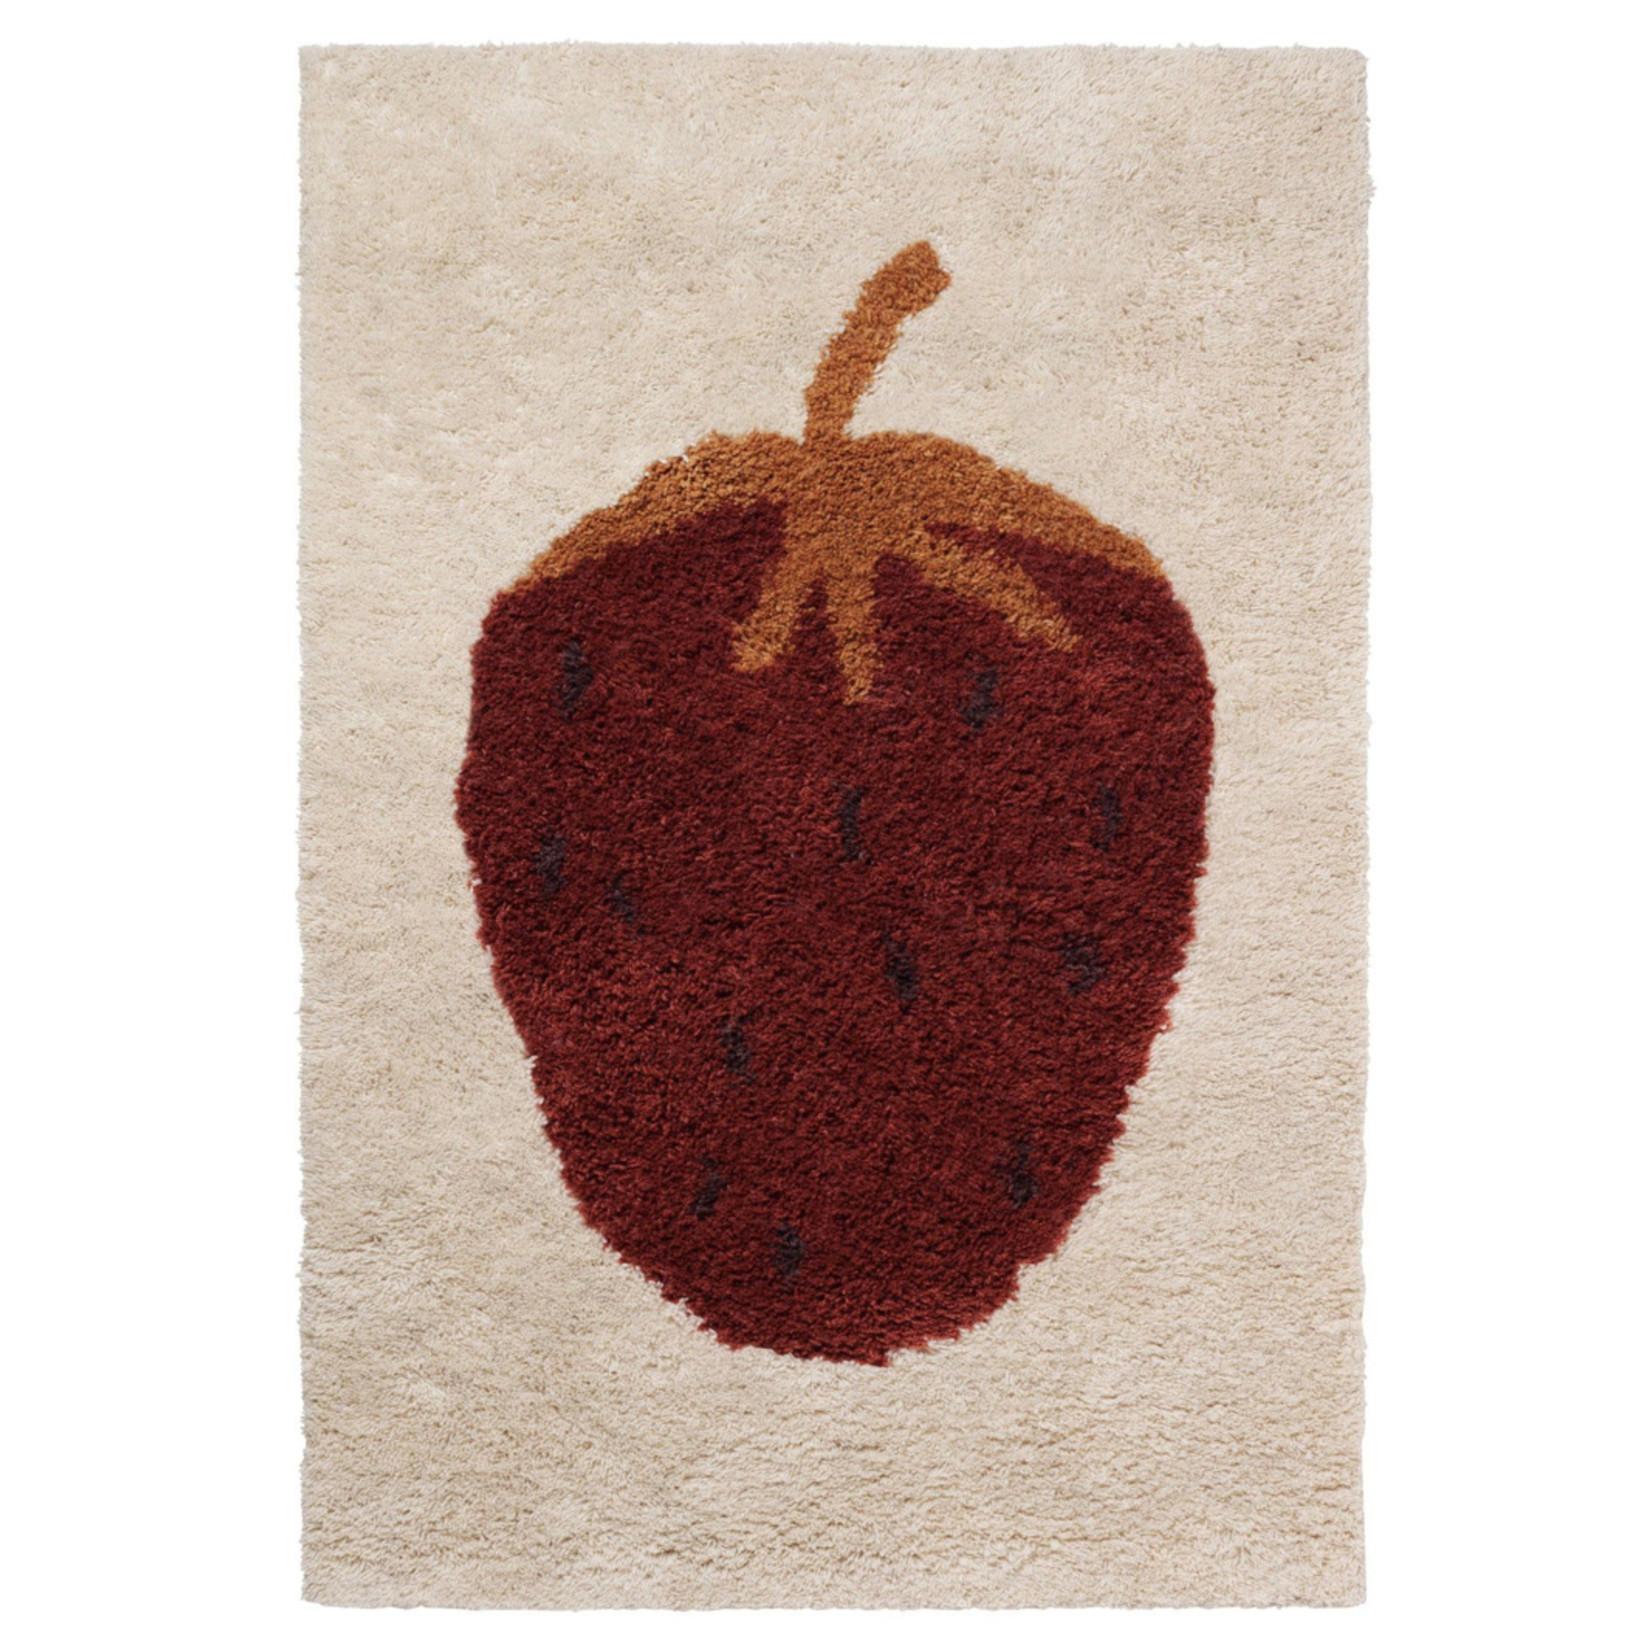 Ferm Living • kleed fruiticana strawberry 120x80